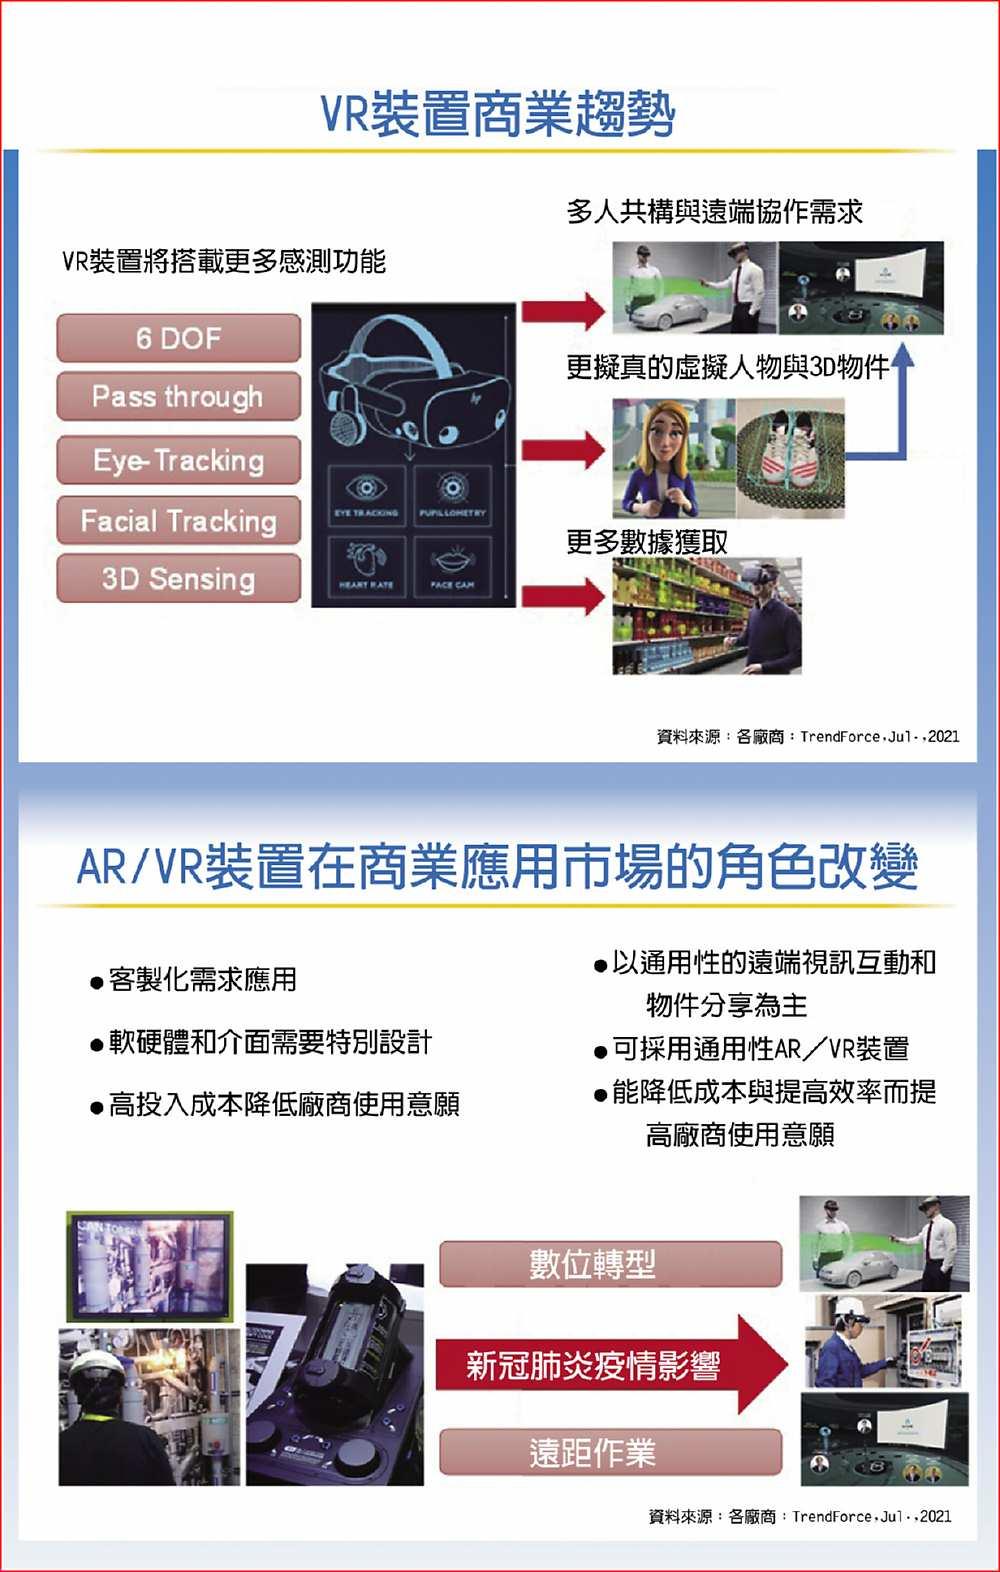 VR裝置商業趨勢 AR/VR裝置在商業應用市場的角色改變